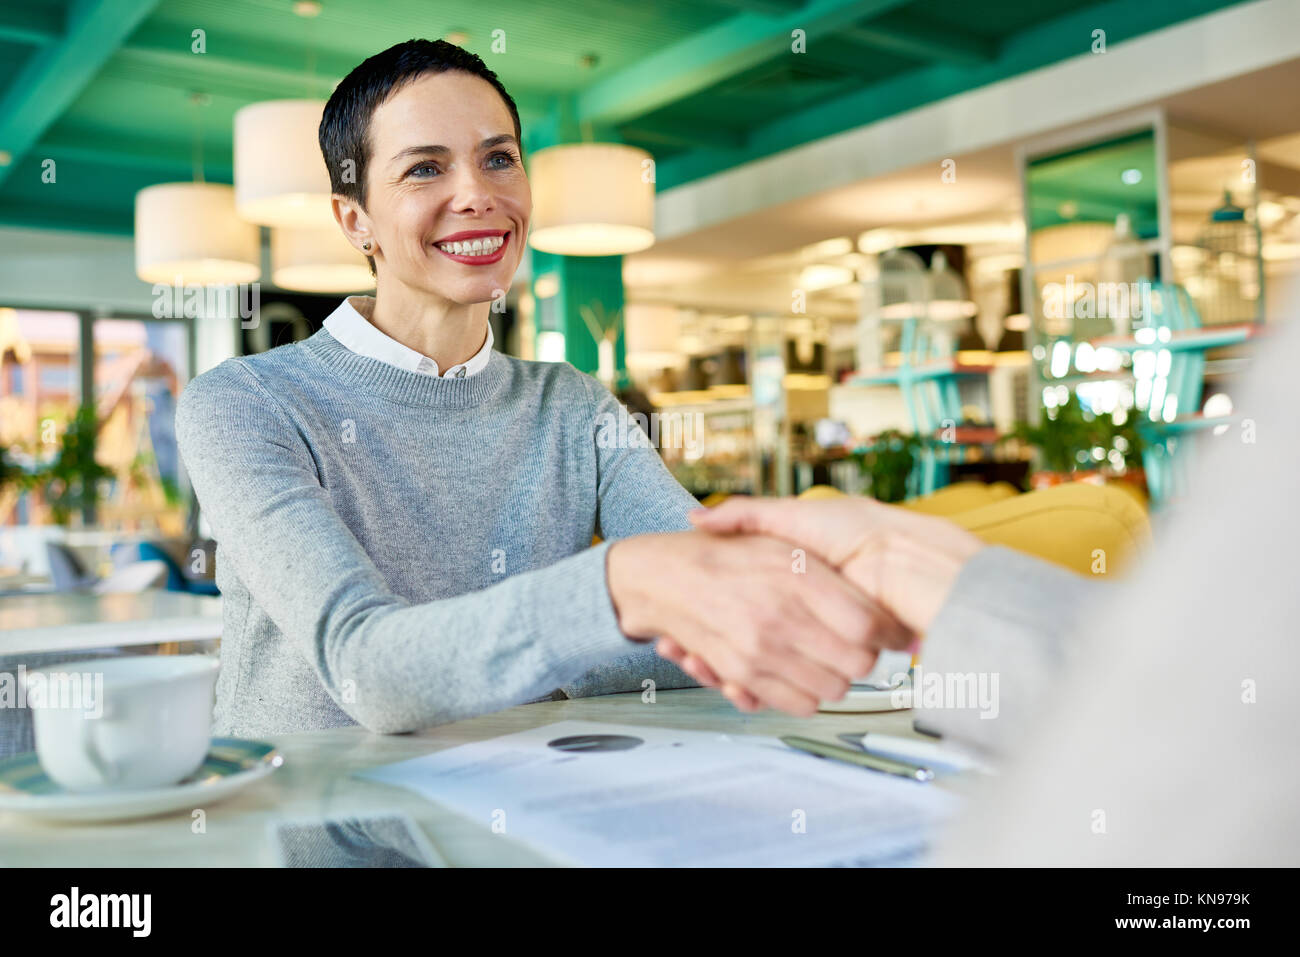 Businesswomen Shaking Hands in Meeting Photo Stock